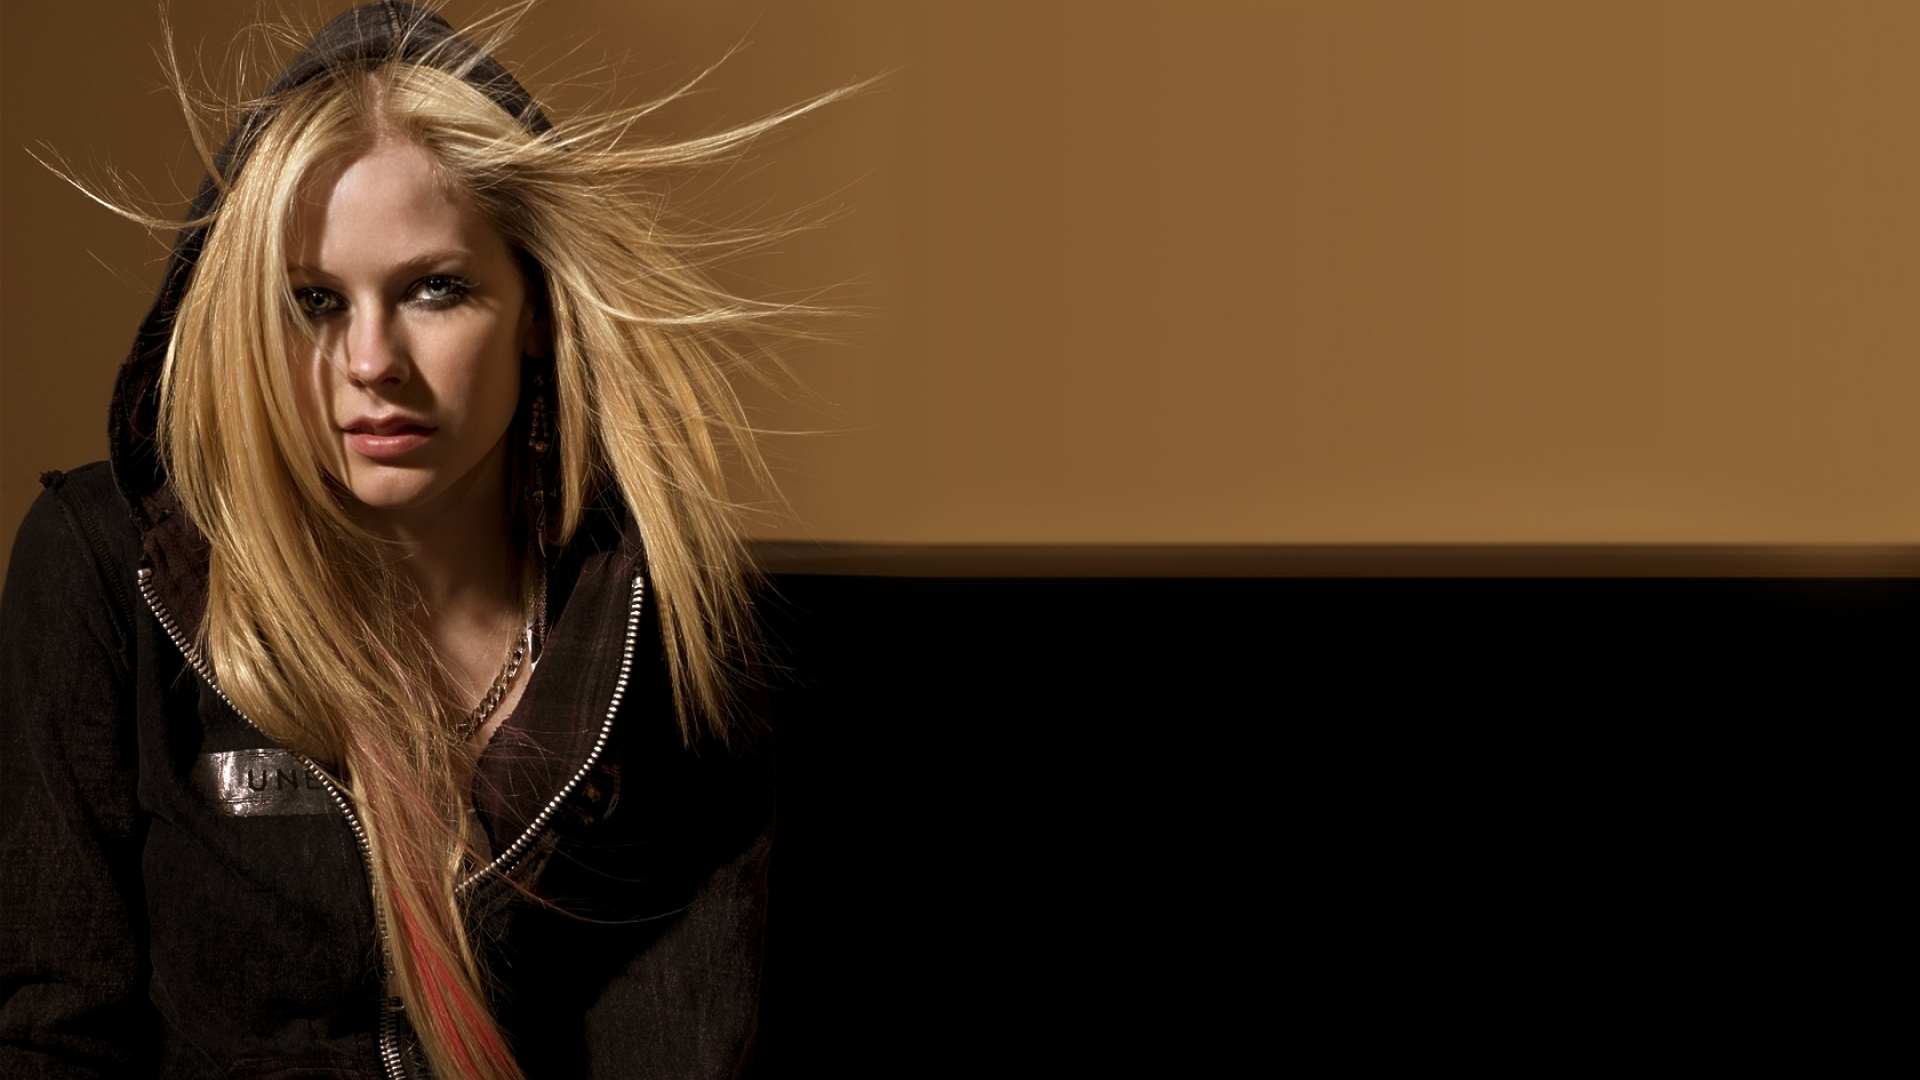 Free Download Download Avril Lavigne Wallpaper Hd Wallpaper